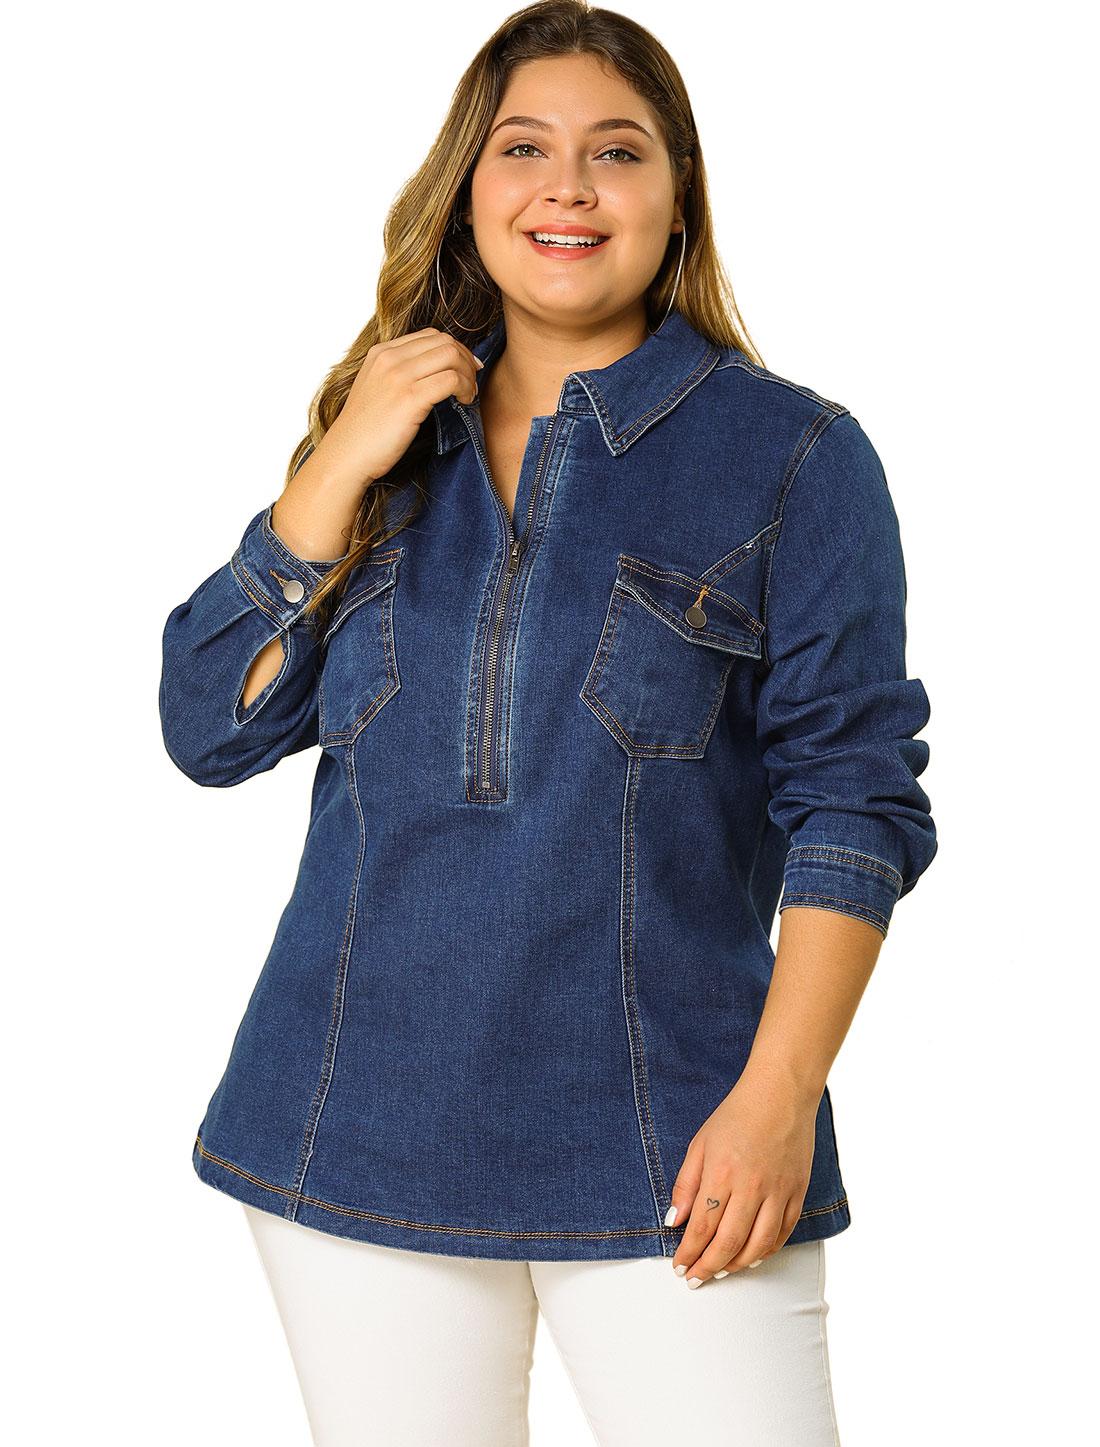 Agnes Orinda Women's Plus Size Zip Up Denim Jacket with Pockets Dark Blue 3X